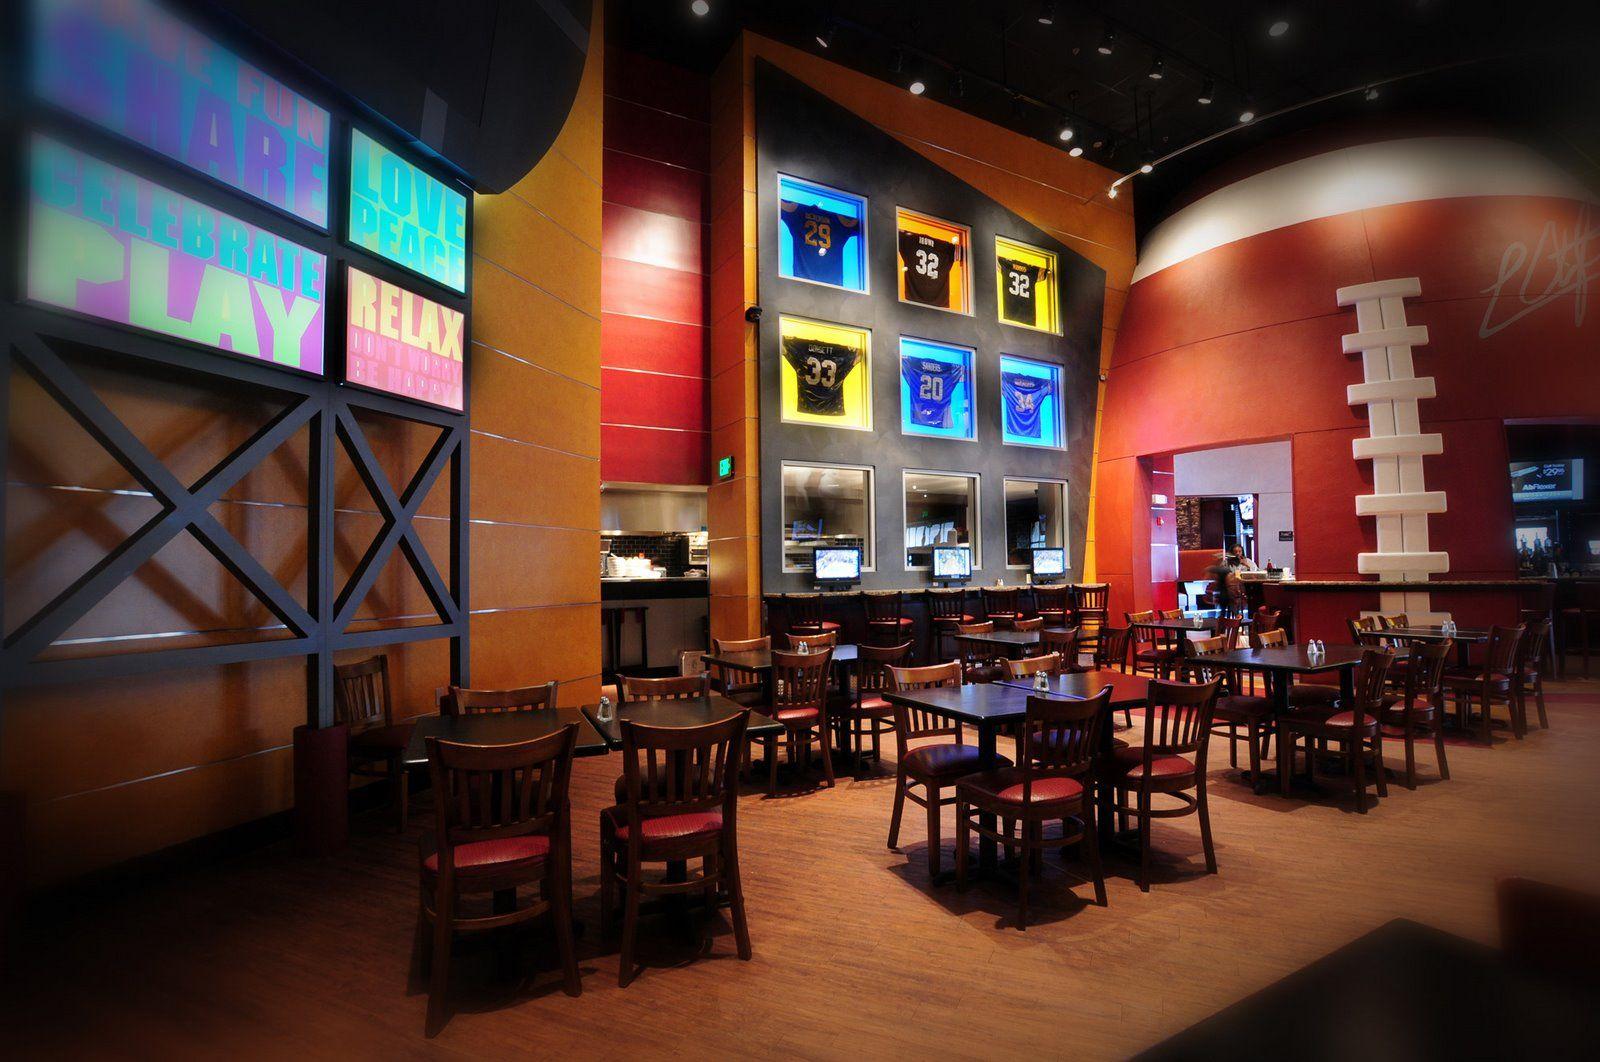 sports bar and restaurant logo ideas - Google Search | Art | Pinterest